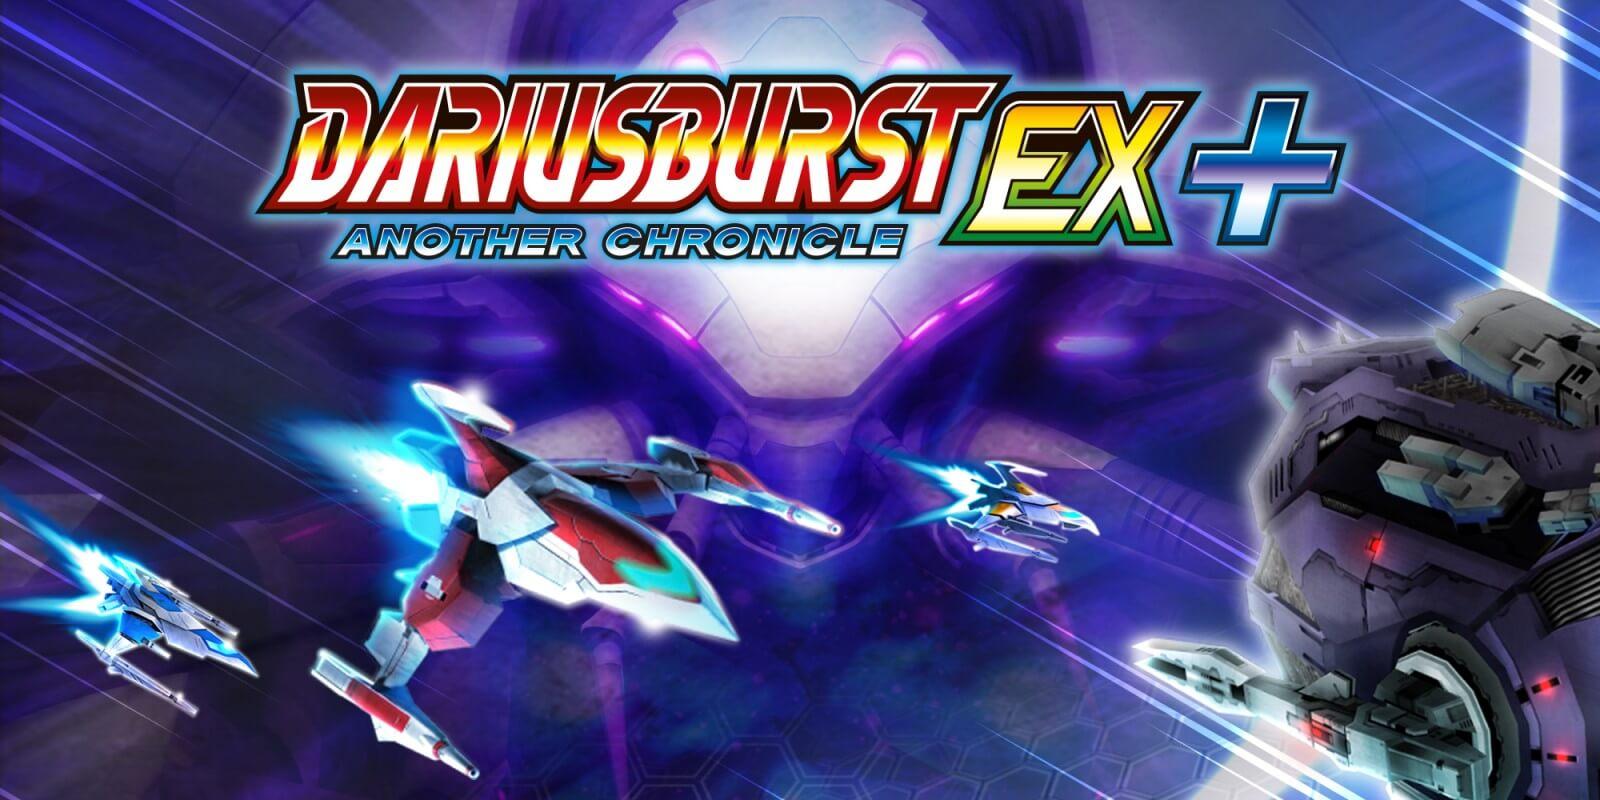 Dariusburst Another Chronicle EX+ Free PC Download